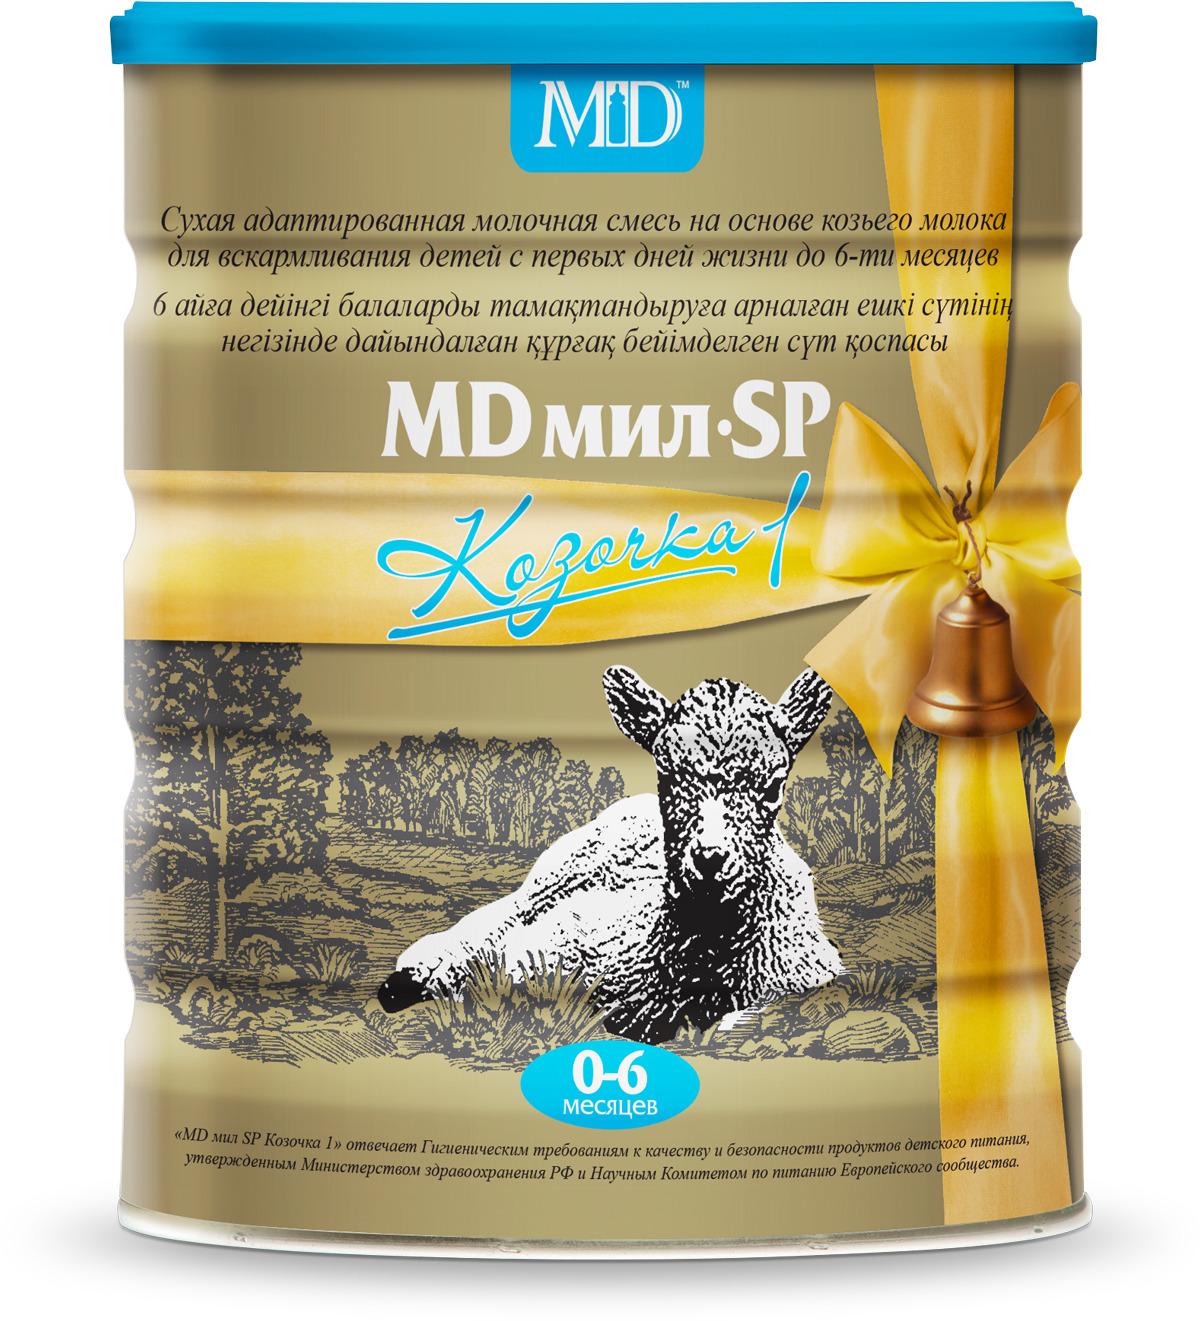 MD Мил SP Козочка 1 Смесь молочная с 0 до 6 месяцев, 800 г md мил sp козочка 2 молочная смесь с 6 до 12 месяцев 400 г